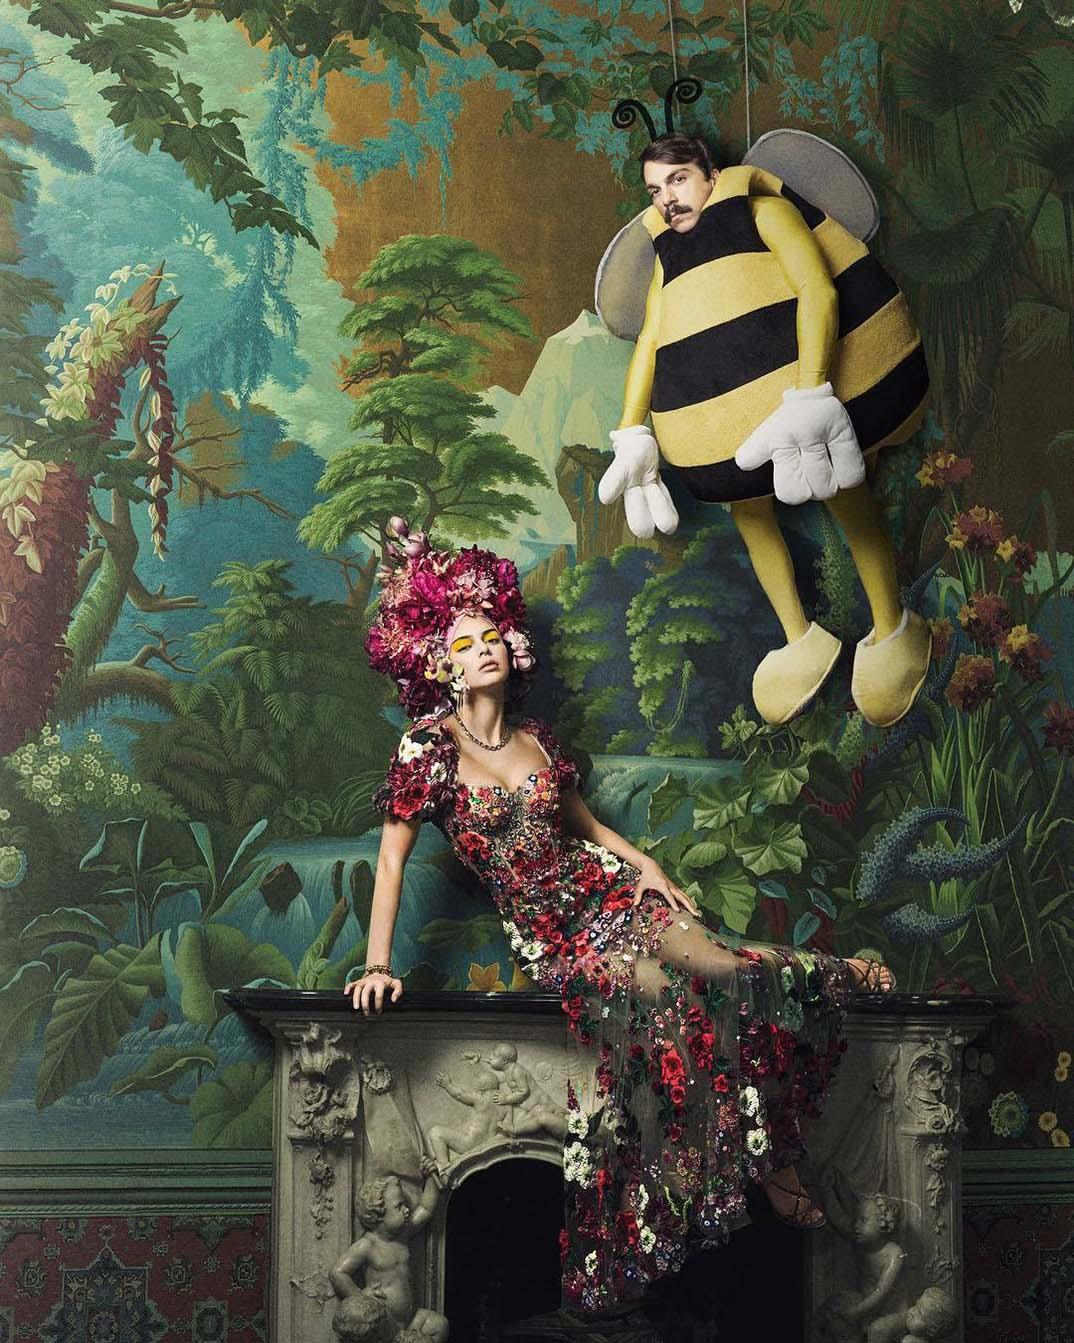 couch/uploads/image/artikkler/2019/kendall-jenner/Man-Photoshops-Himself-Into-Kendall-Jenner-Photos-1.jpg